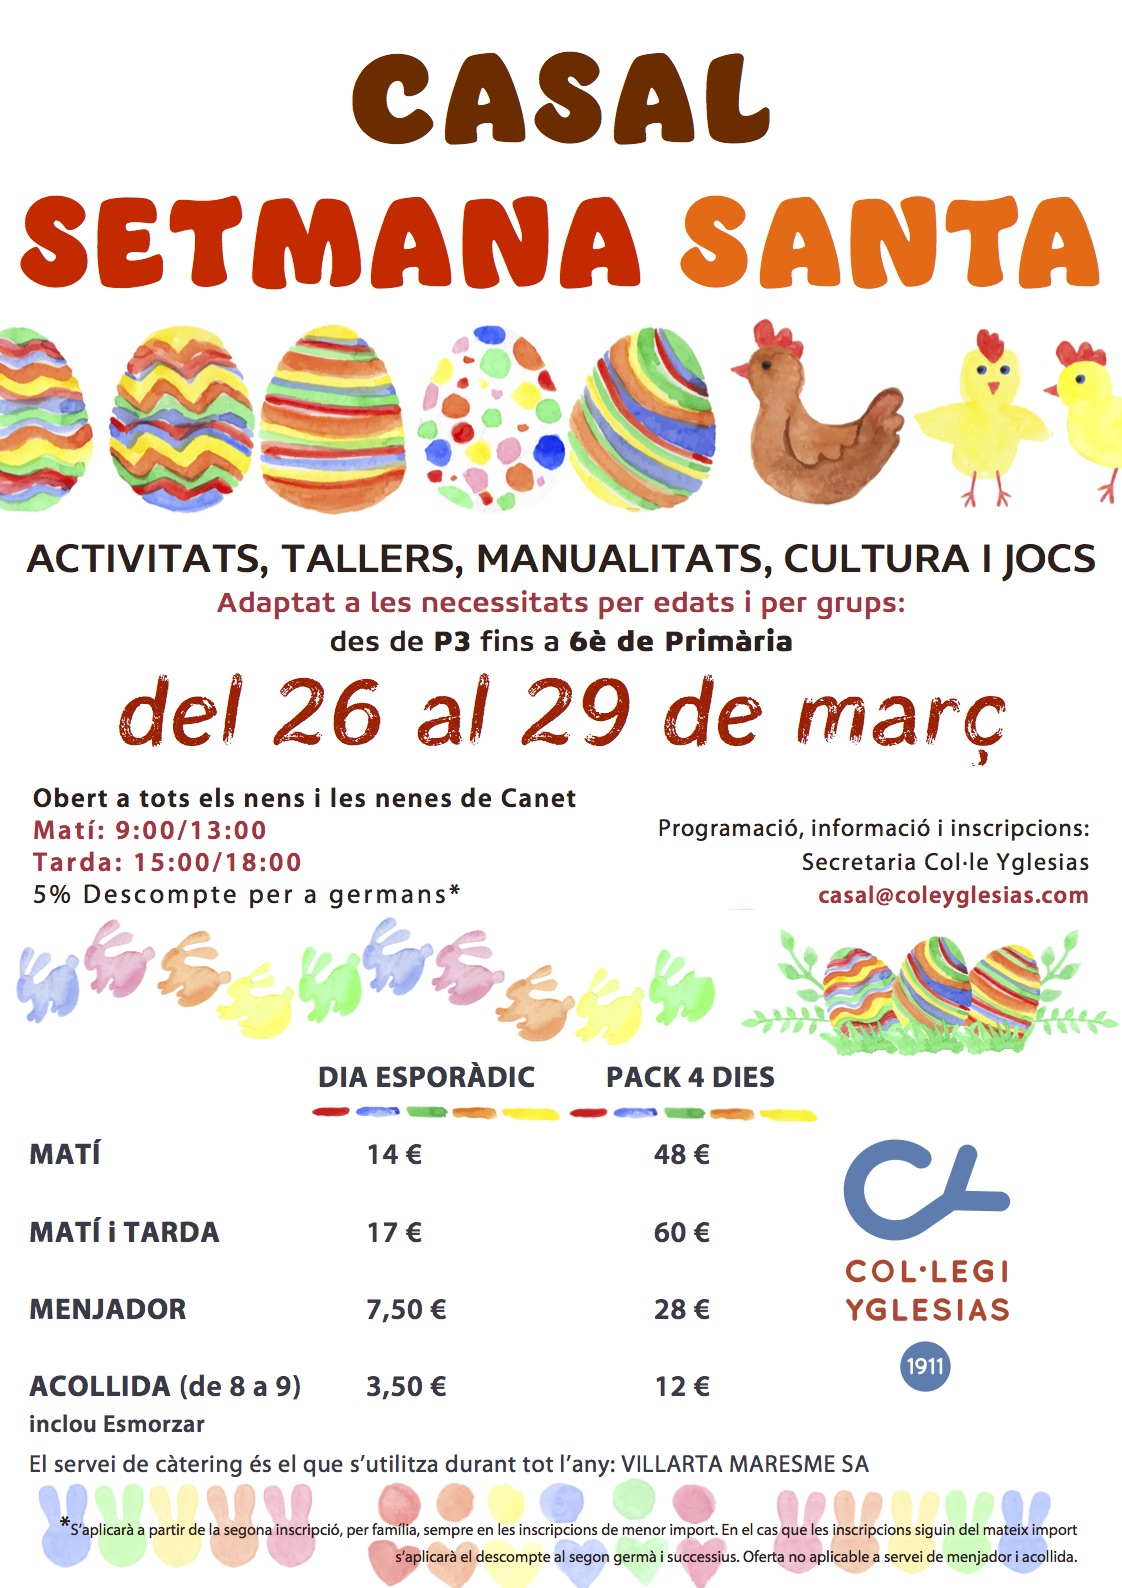 Casal Yglesias Easter 2018